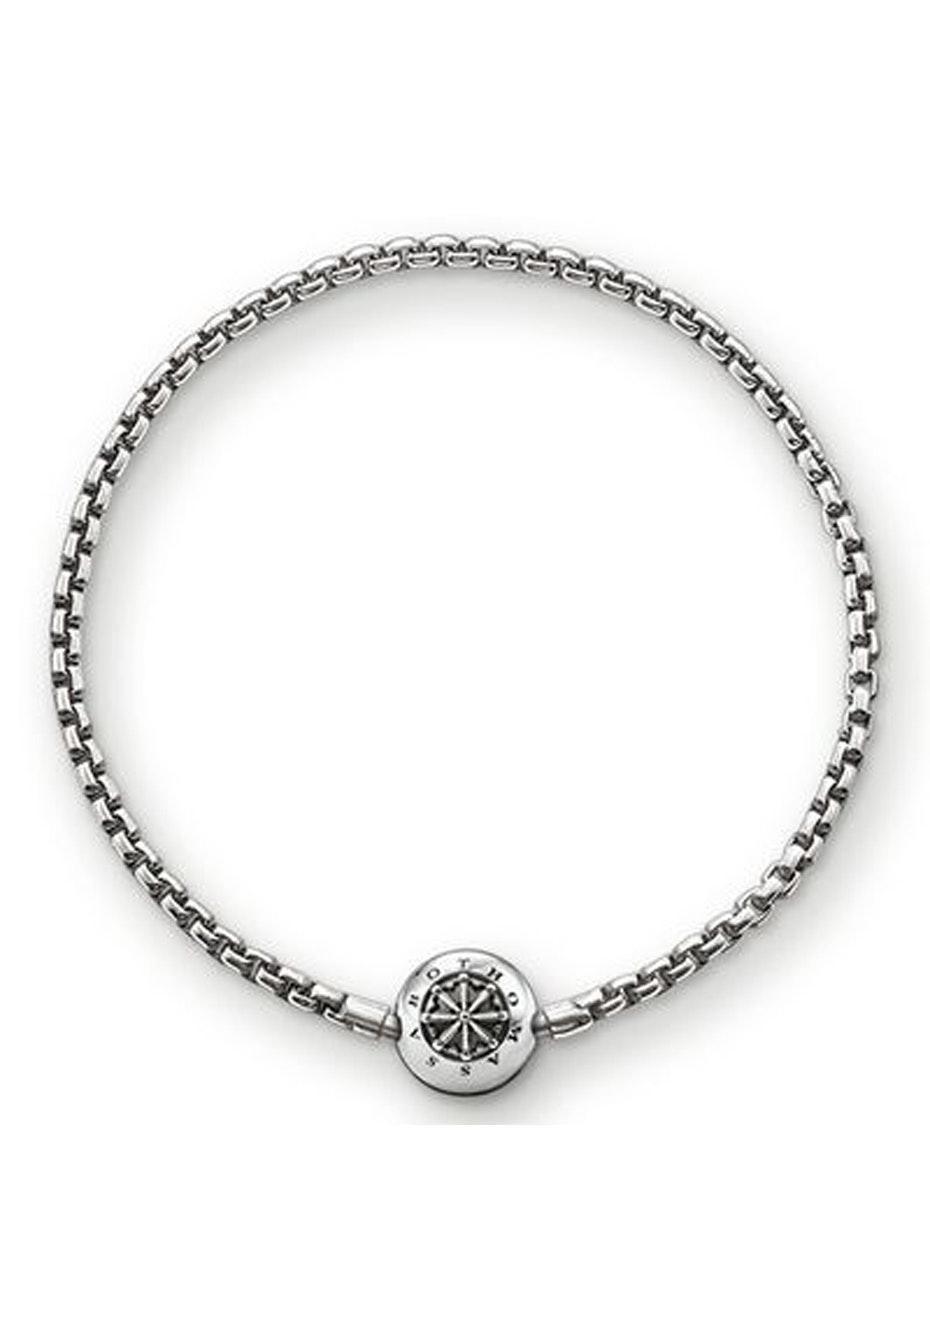 Thomas Sabo  - Karma Bracelet - Oxidised 19Cm